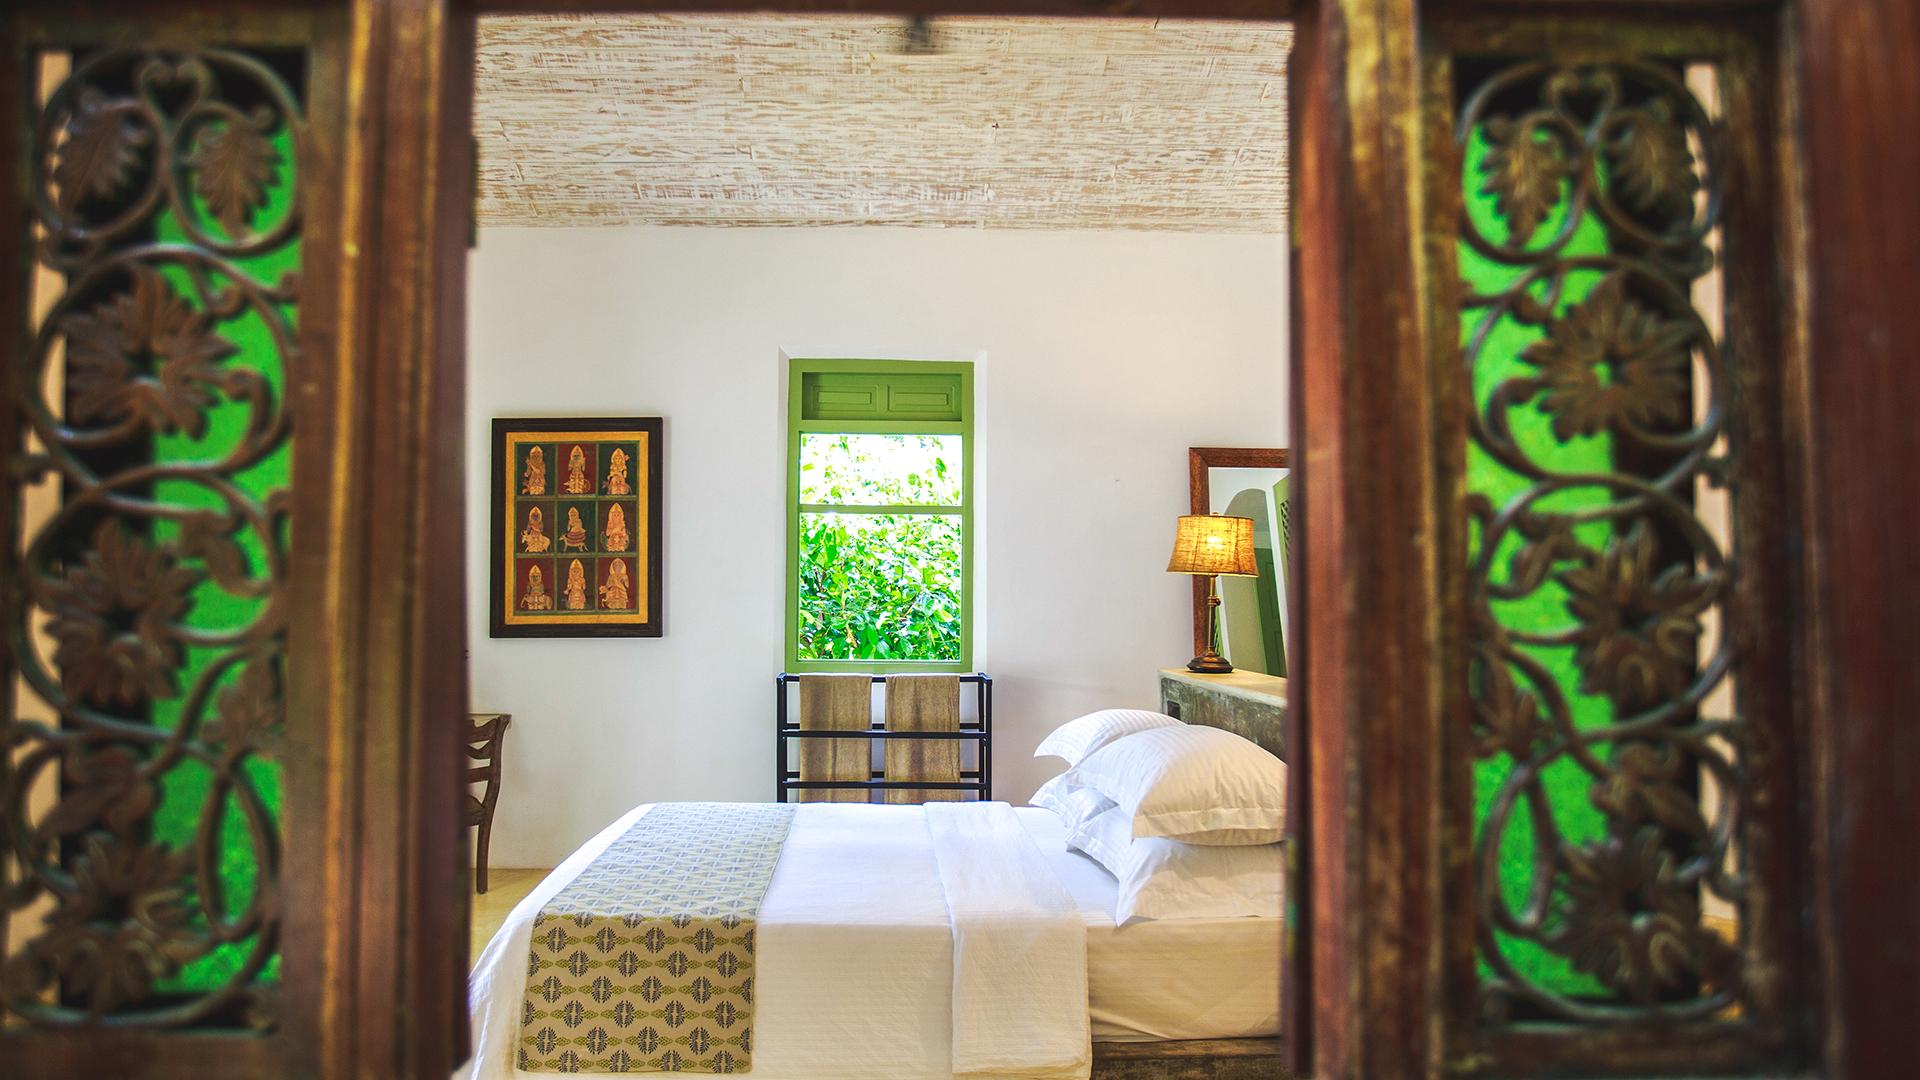 Sri_lanka_holiday_villa_gab_family_honeymoon_suiteArtboard 1 copy 2.jpg